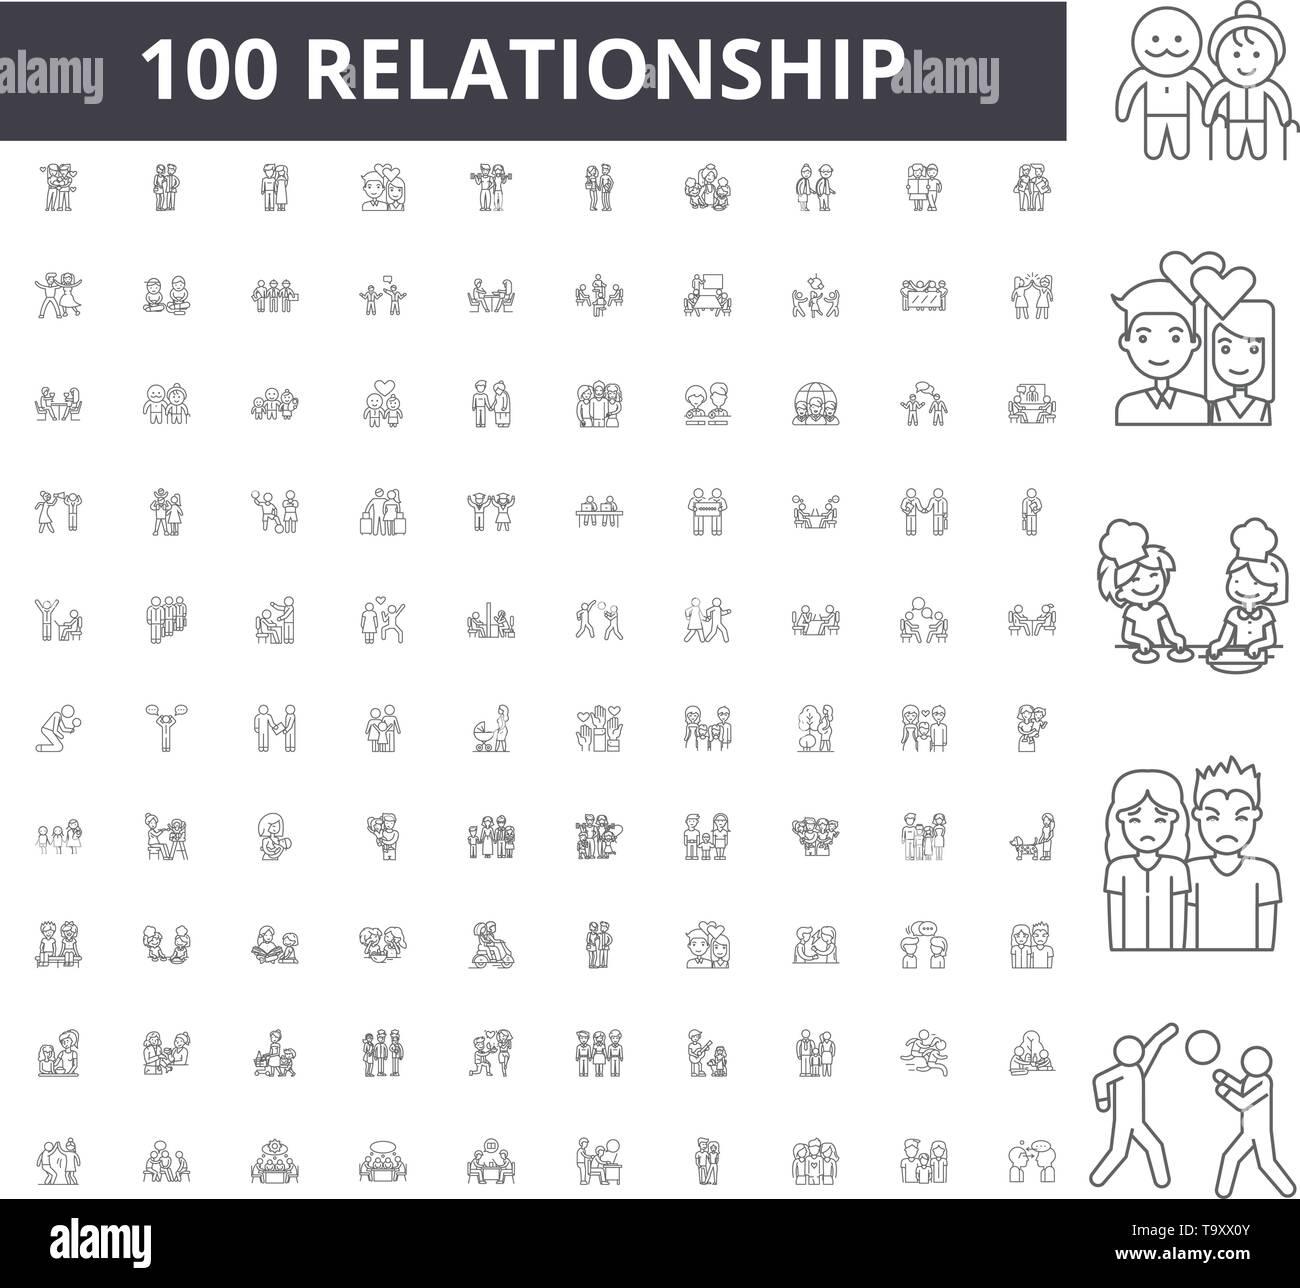 Realtionship line icons, signs, vector set, outline illustration concept  - Stock Image